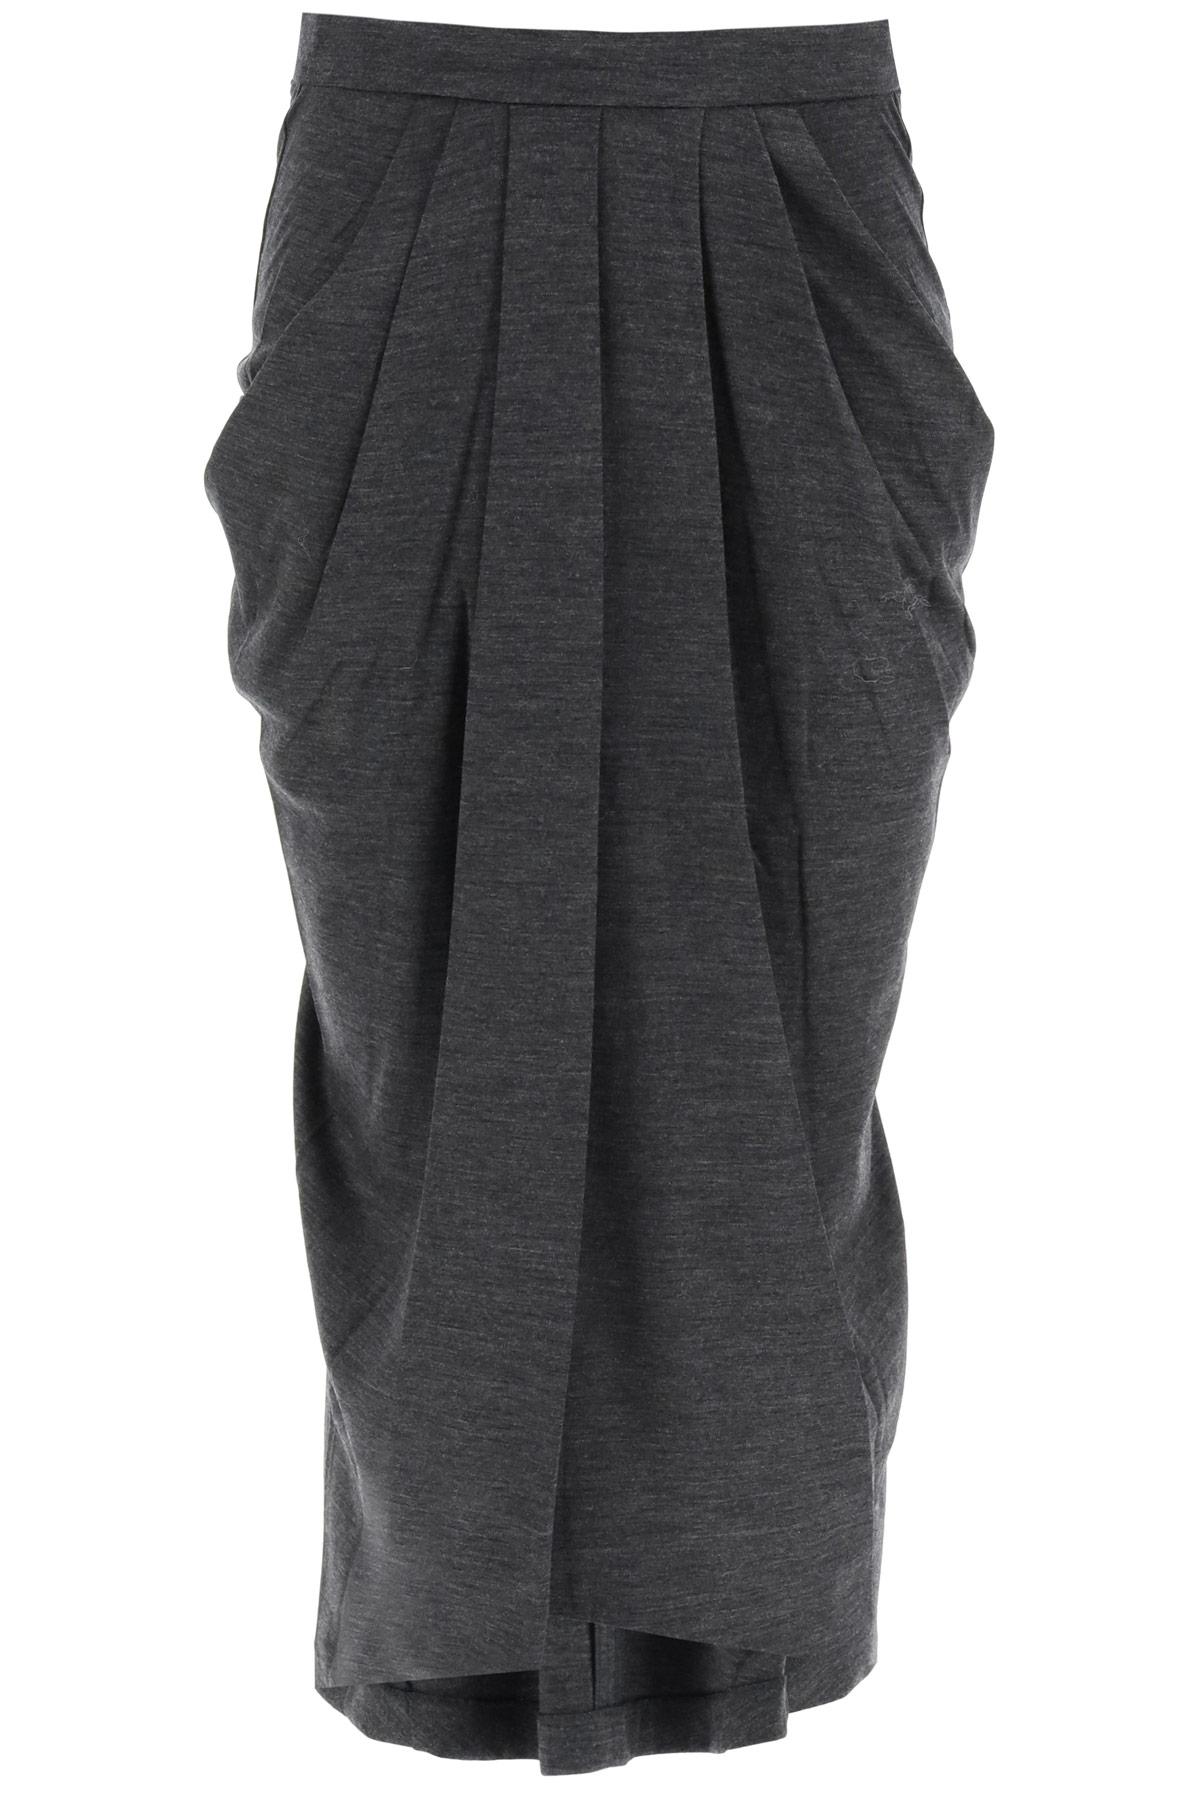 ISABEL MARANT GINKAO MIDI SKIRT 34 Grey Wool